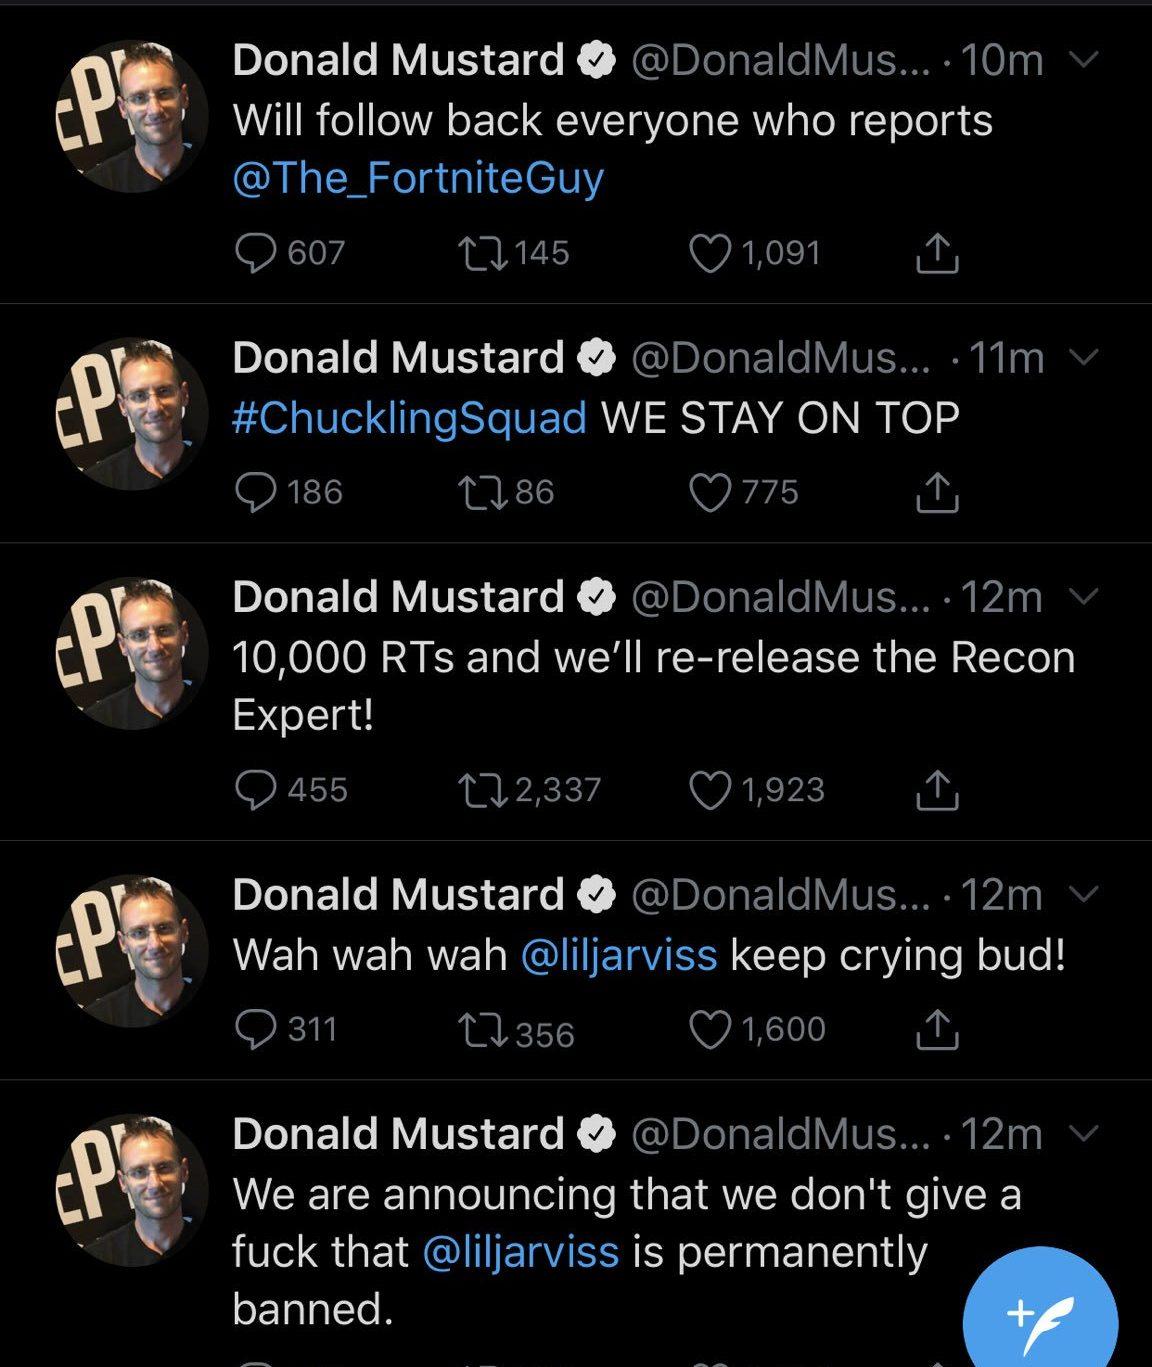 Donald Mustard hacked